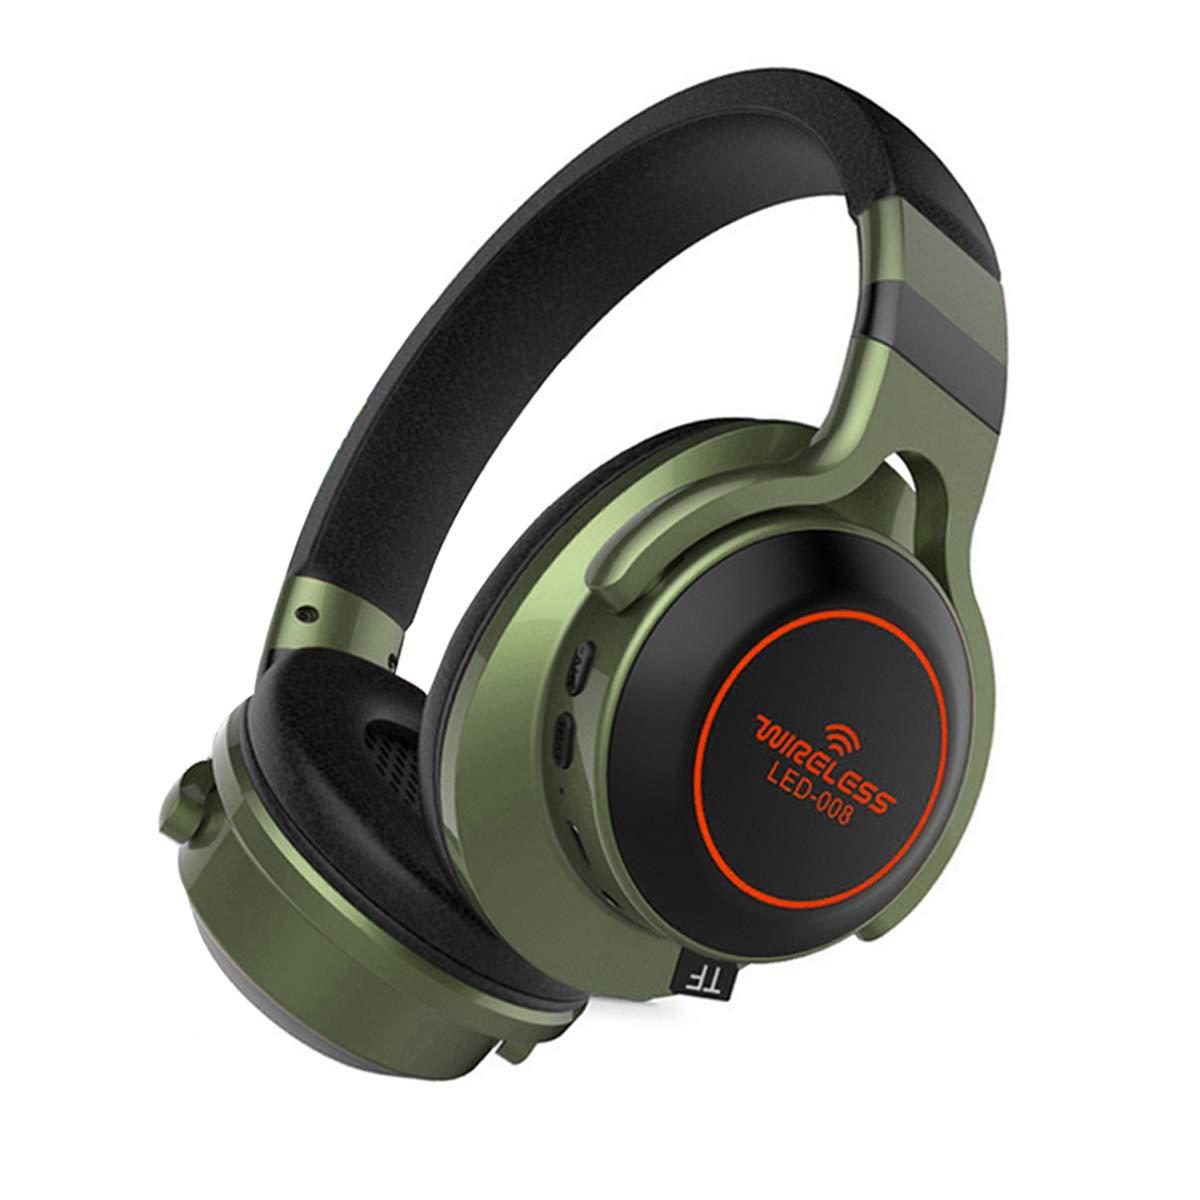 Micoo Headphones, Bluetooth Headphones with Mic Over-Ear Headphones Wireless/Wired Headphones Comfortable Stereo